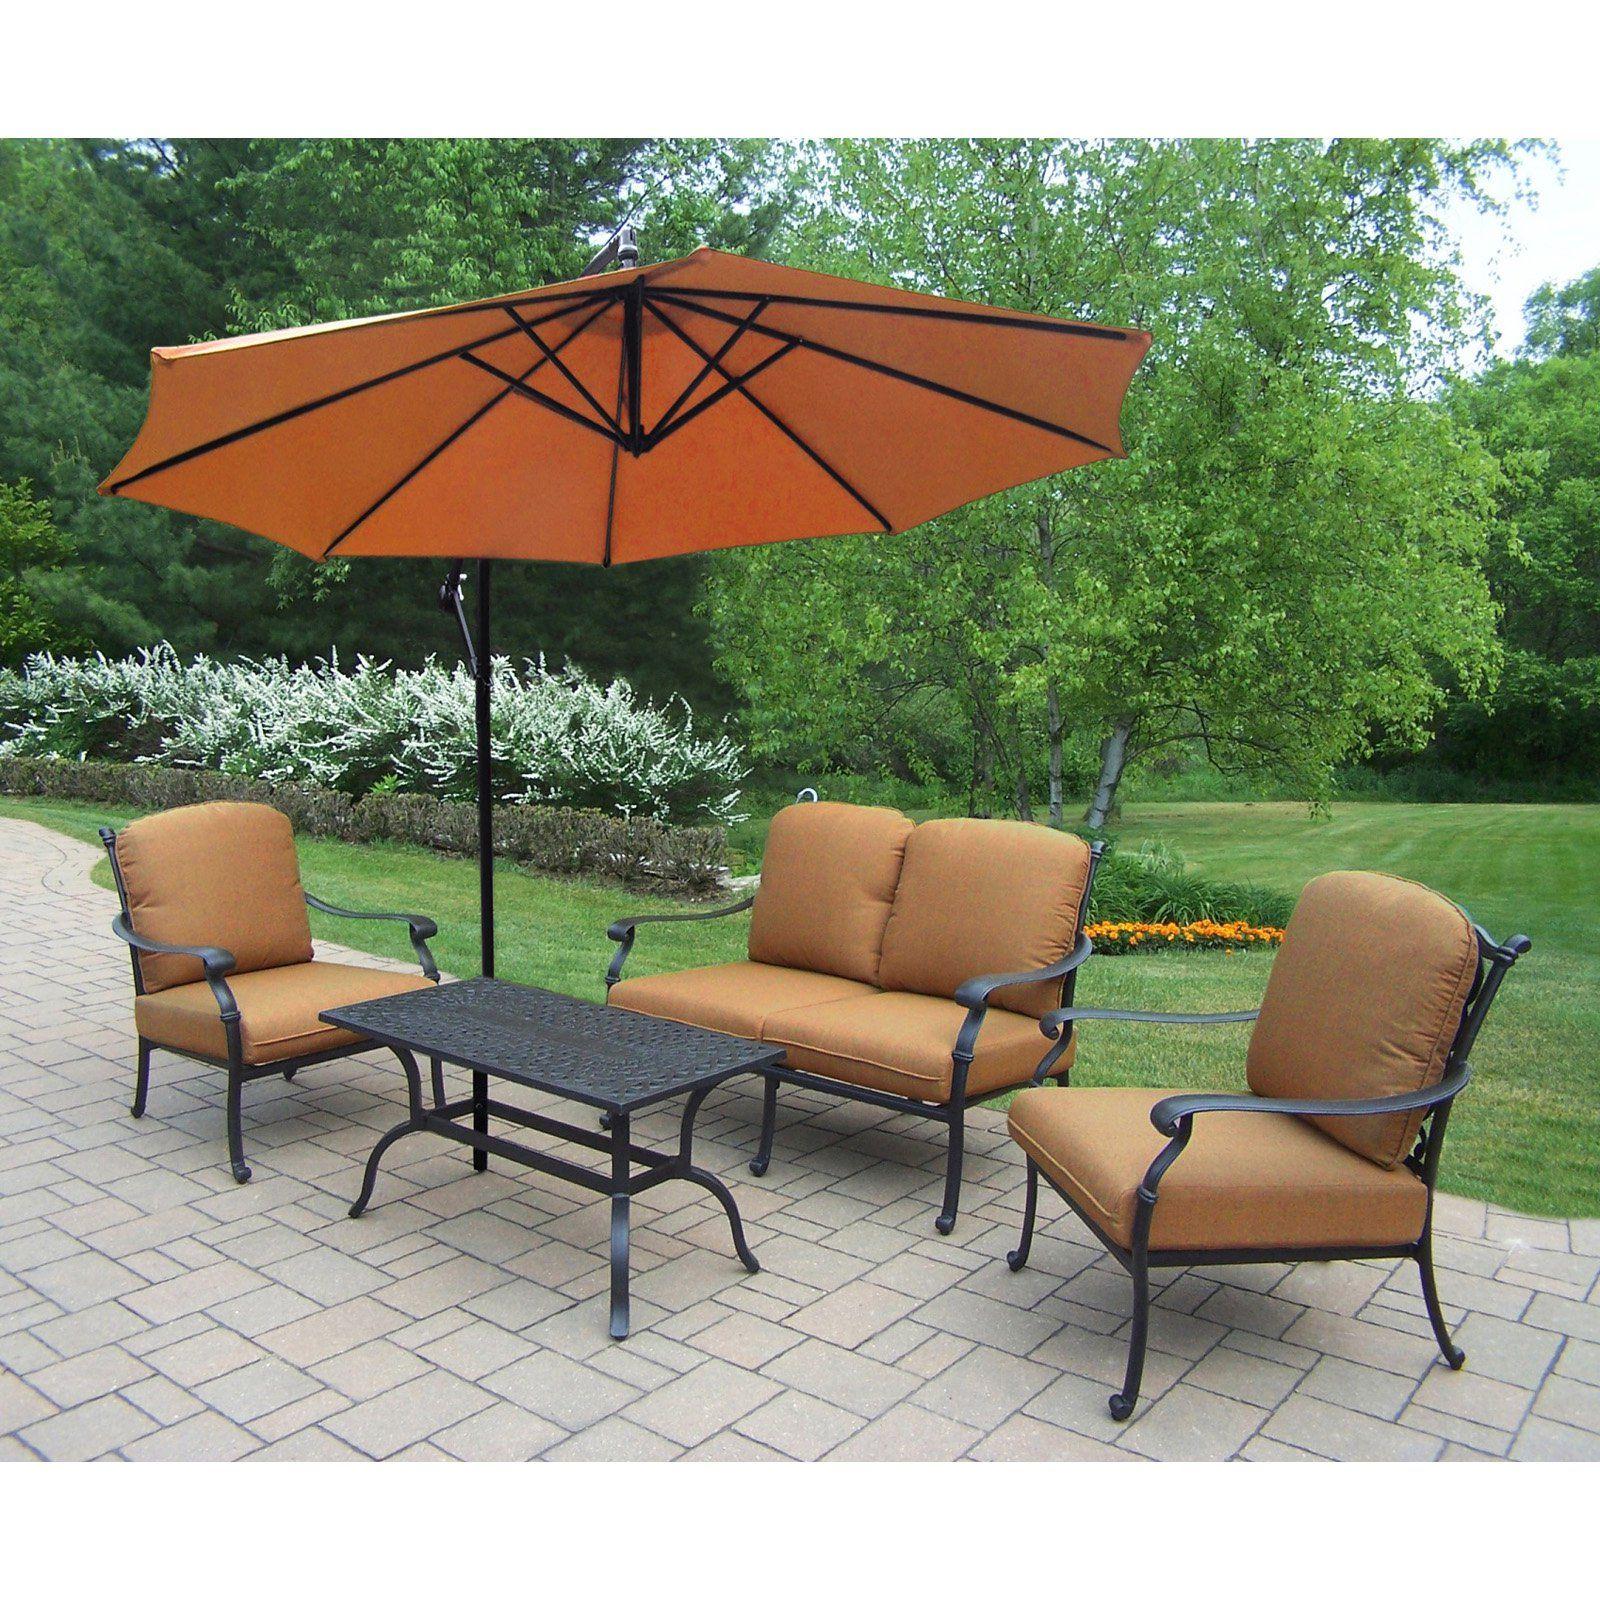 Sunbrella Patio Furniture Sets.Outdoor Oakland Living Hampton 4 Piece Chat Set With Sunbrella Patio